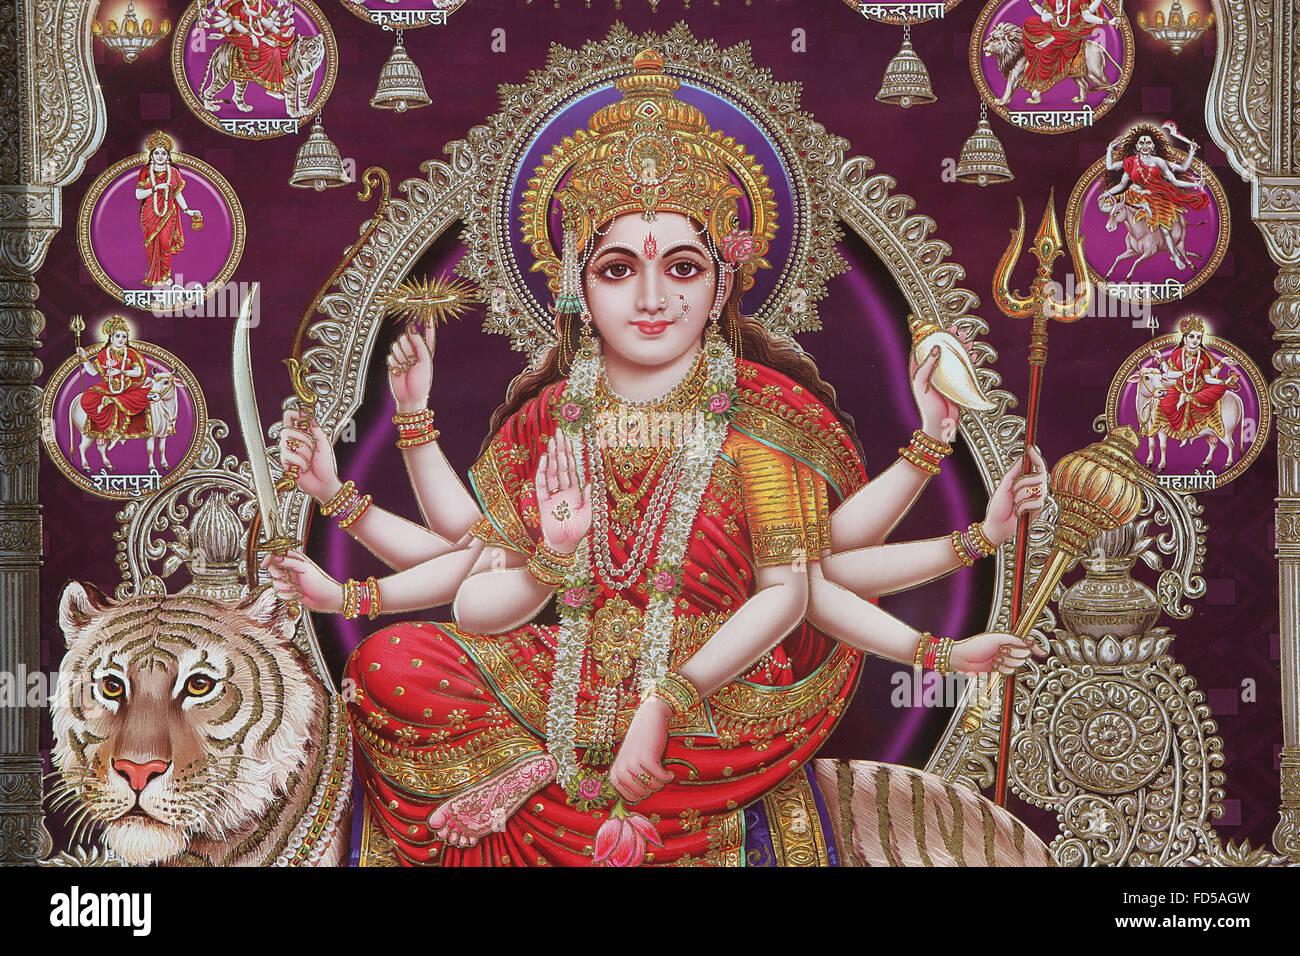 Hindu goddess Durga. - Stock Image